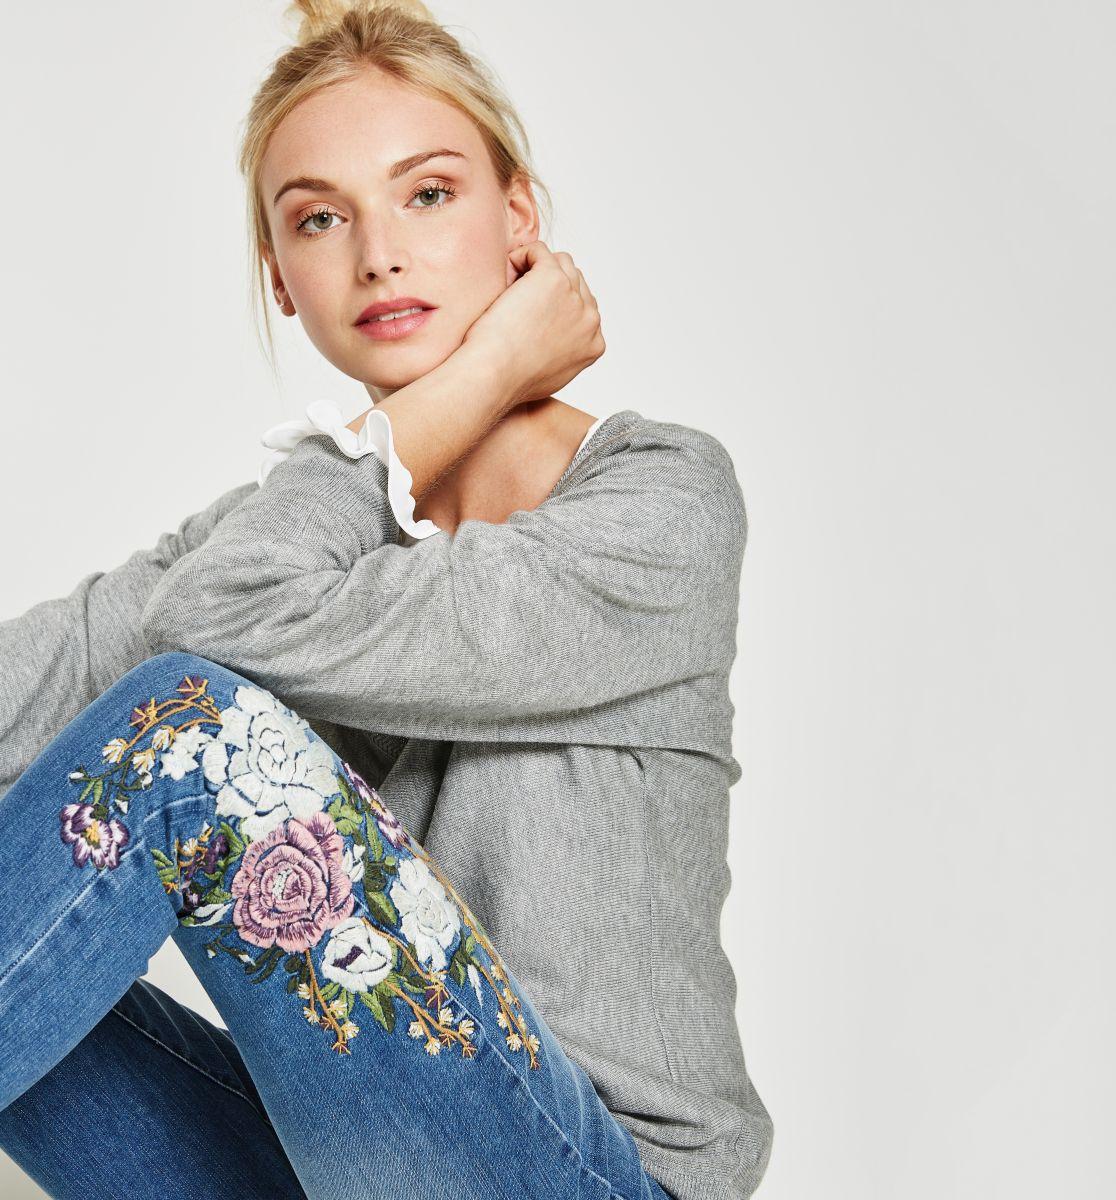 BlogStar: Trend sezonu: jesienne kwiaty - BlogStar.pl